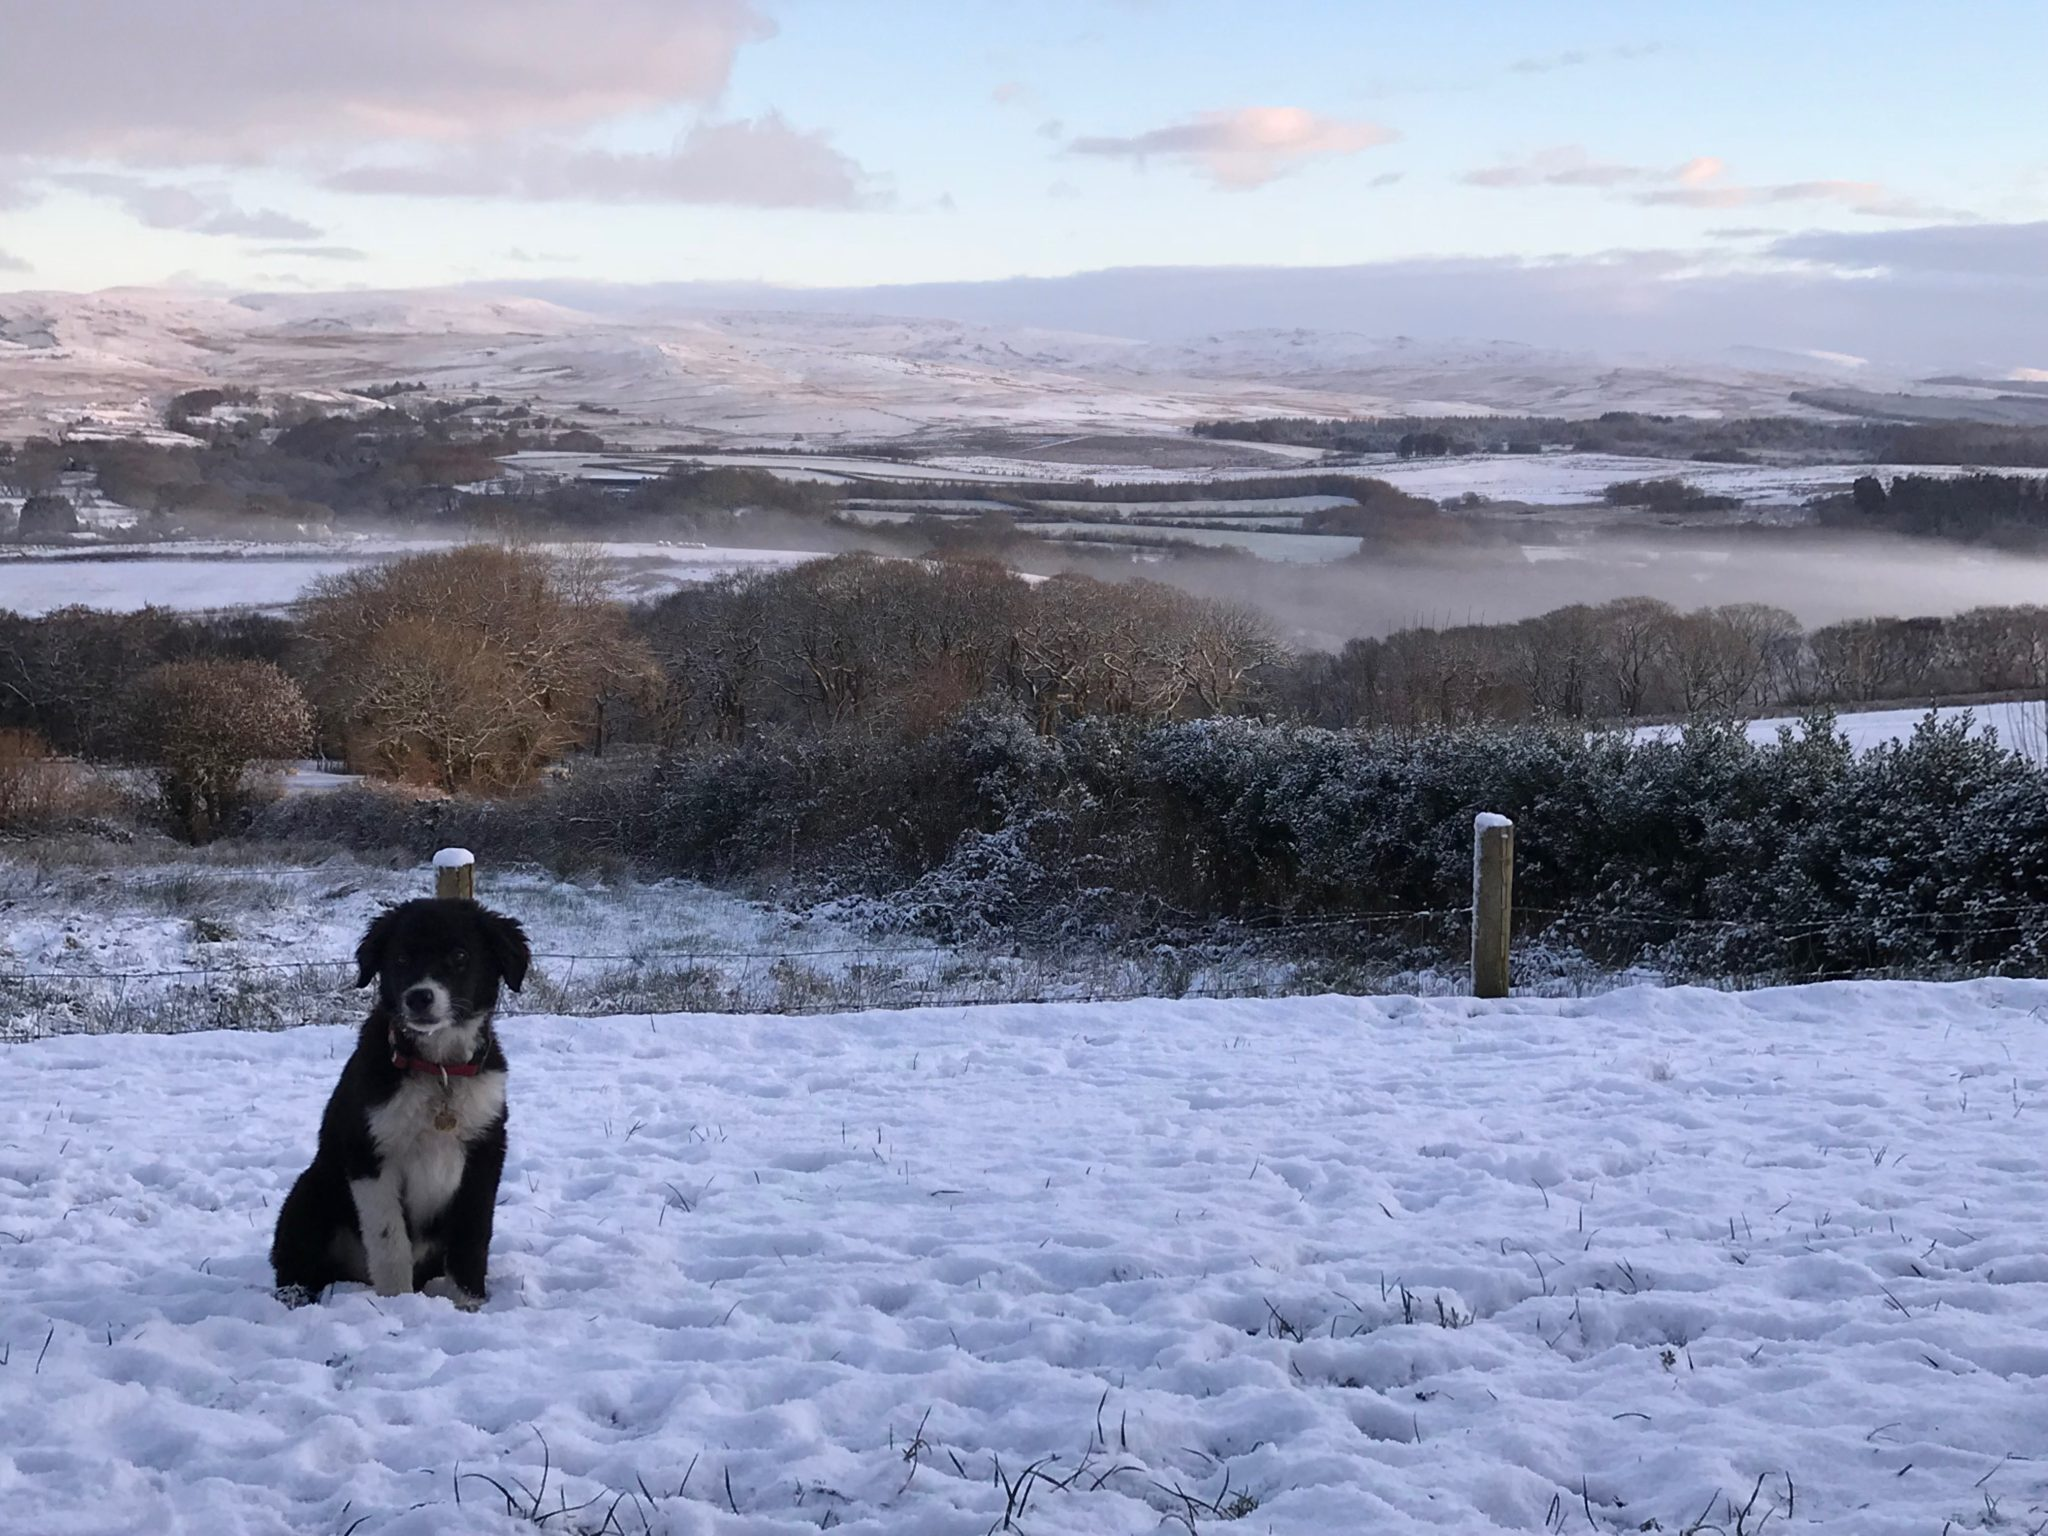 Cwtch Farm Dogs in Brecon Beacons